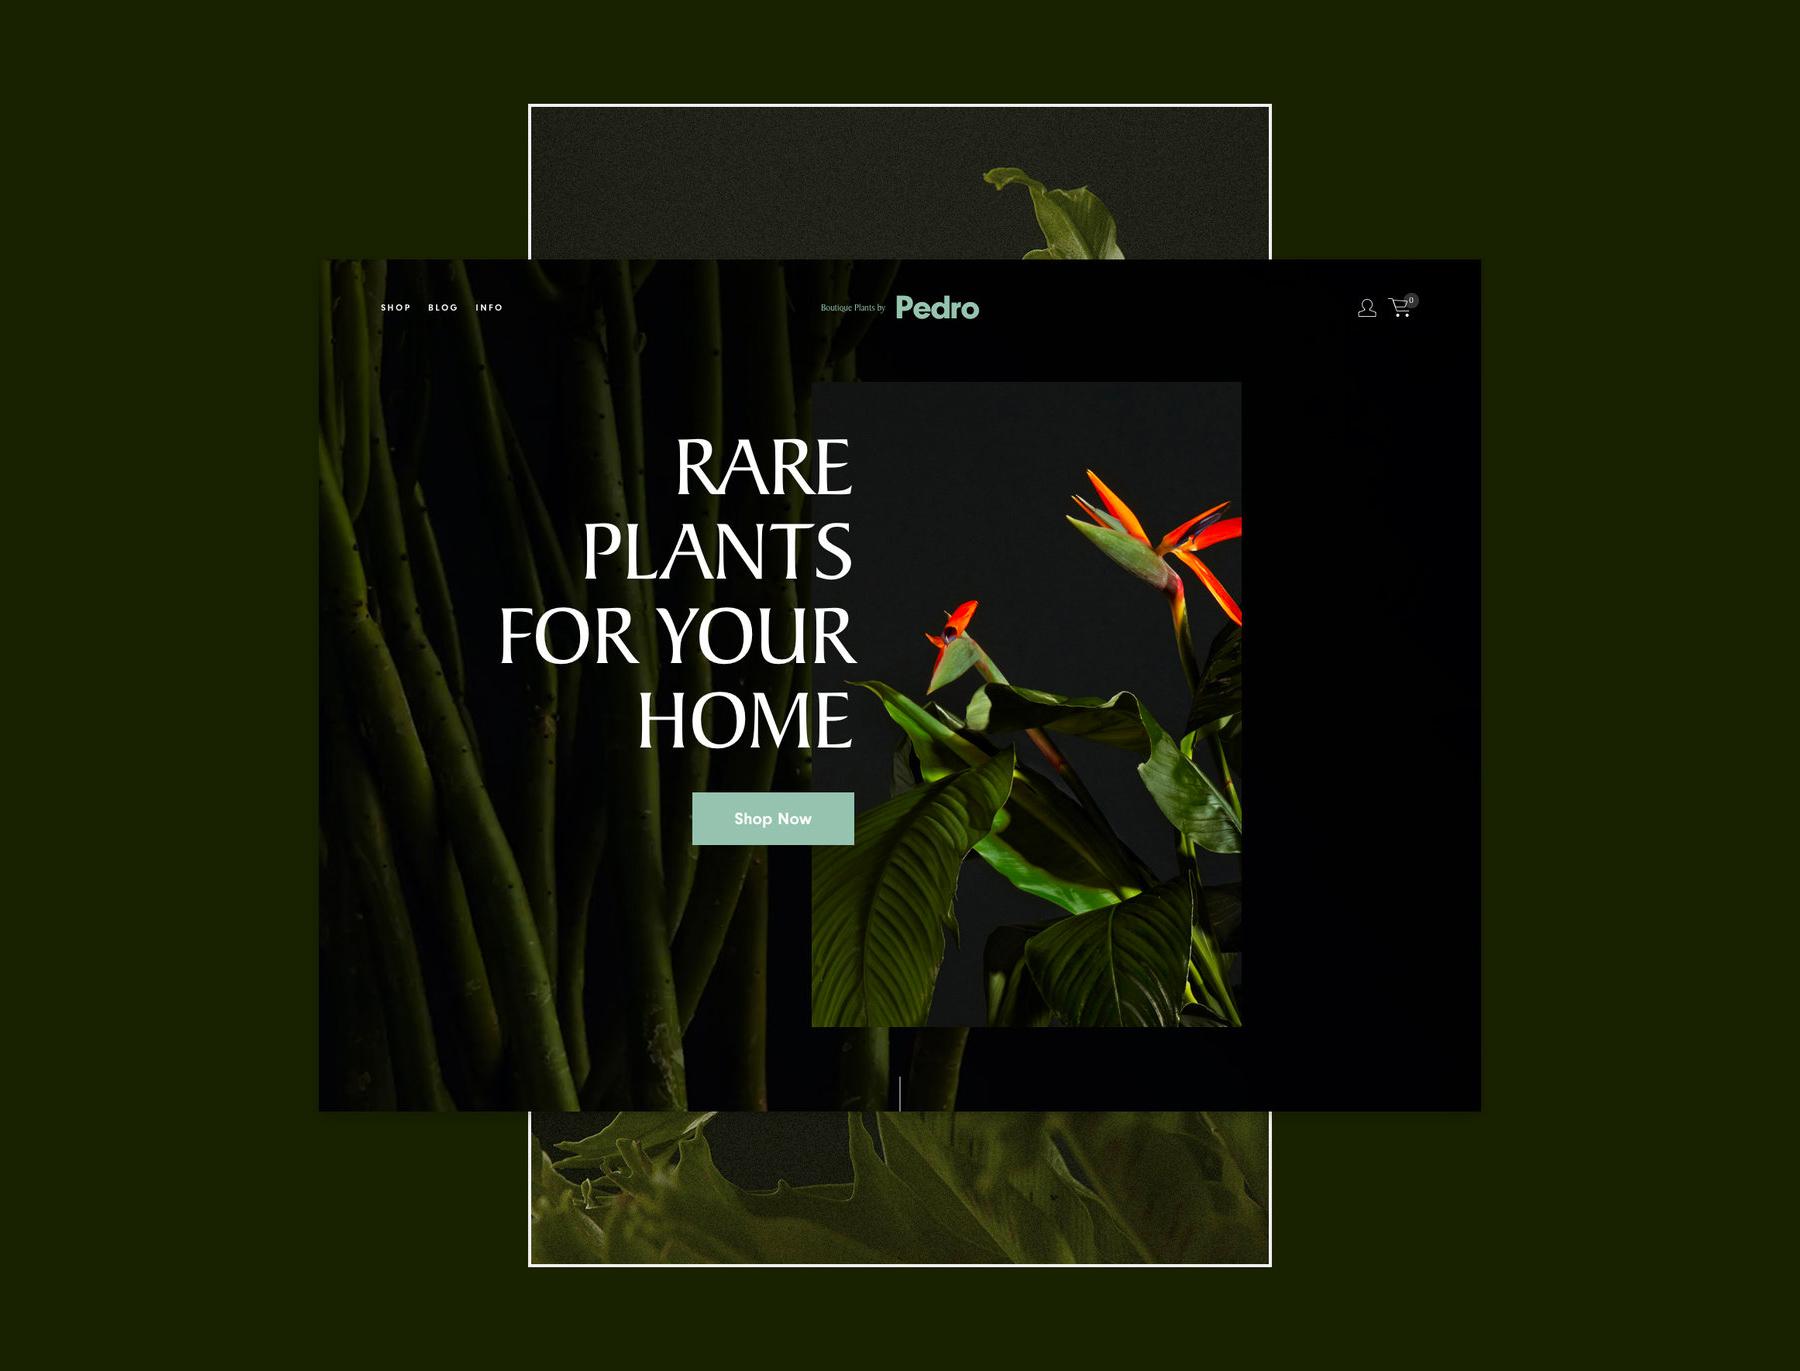 Pedro - Photo art direction / web / branding